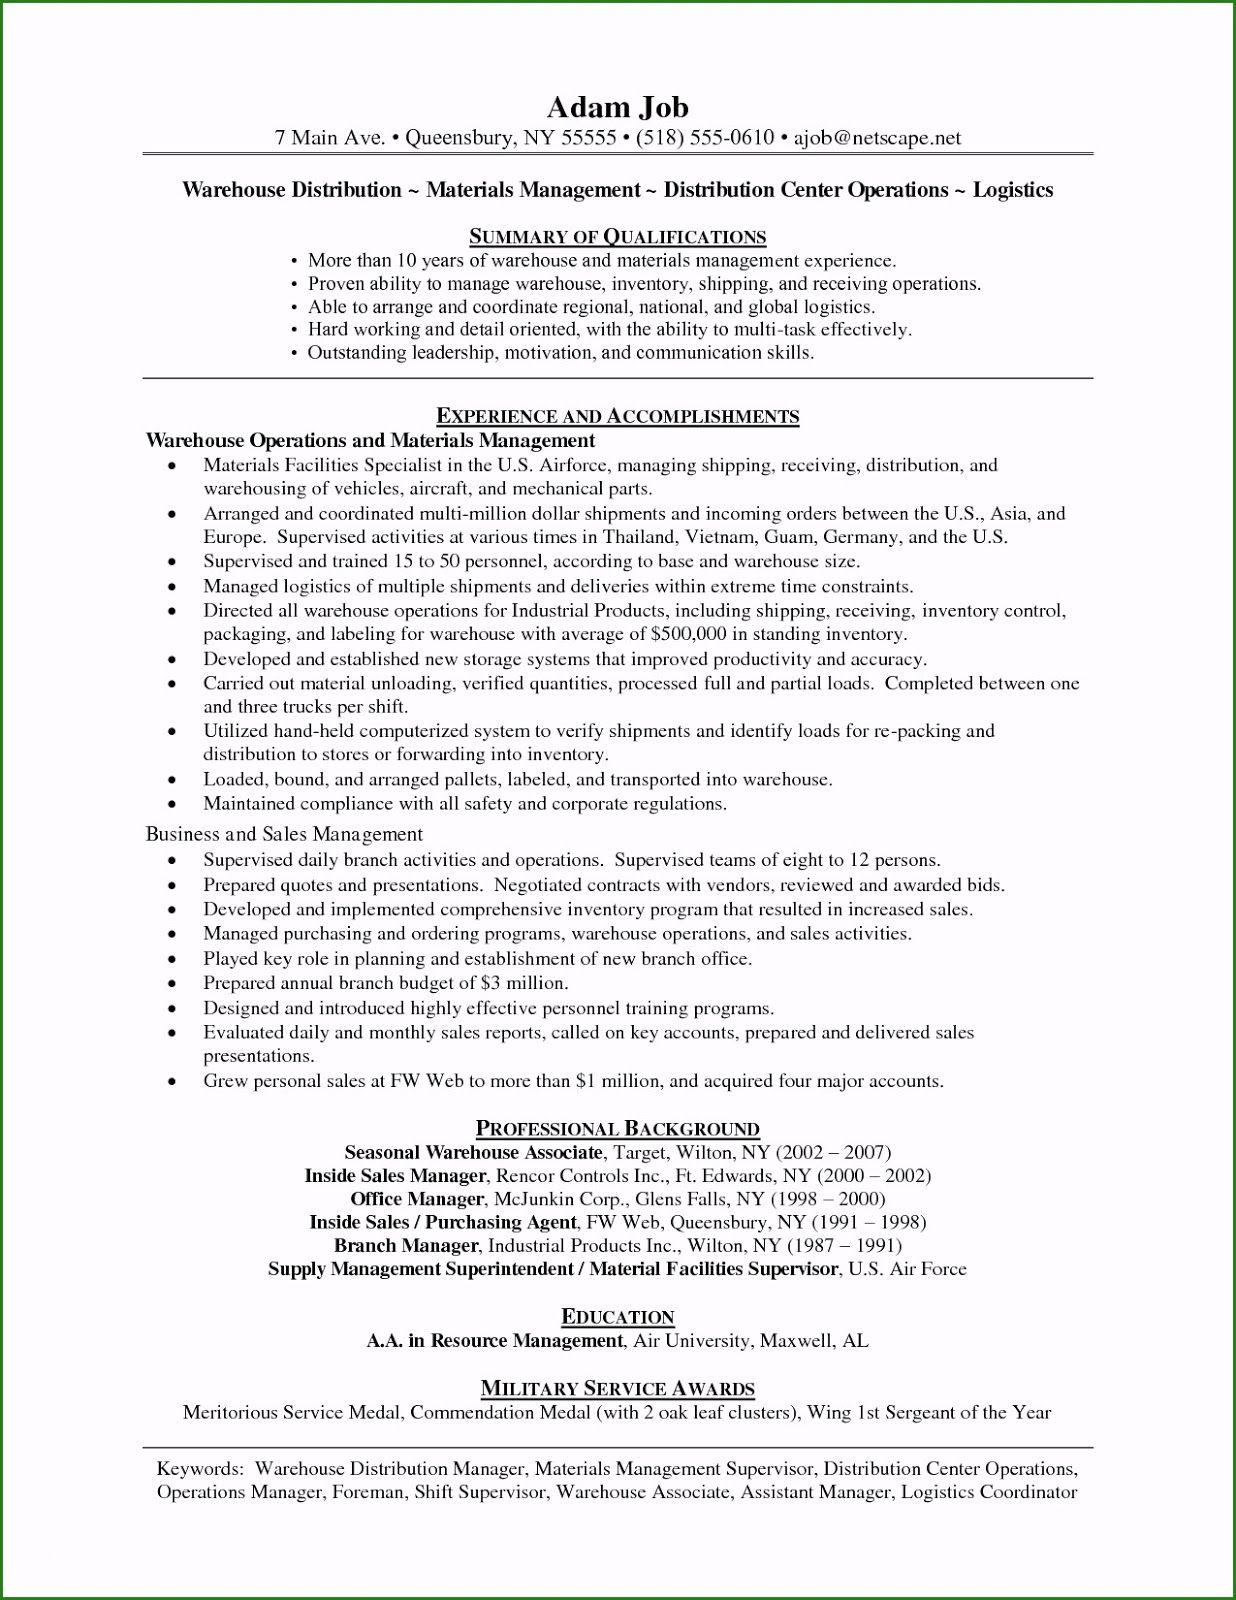 Warehouse Resume Template Free 2019 Warehouse Manager Resume Templates 2020 Warehouse Clerk Resu Warehouse Resume Resume Objective Examples Job Resume Examples